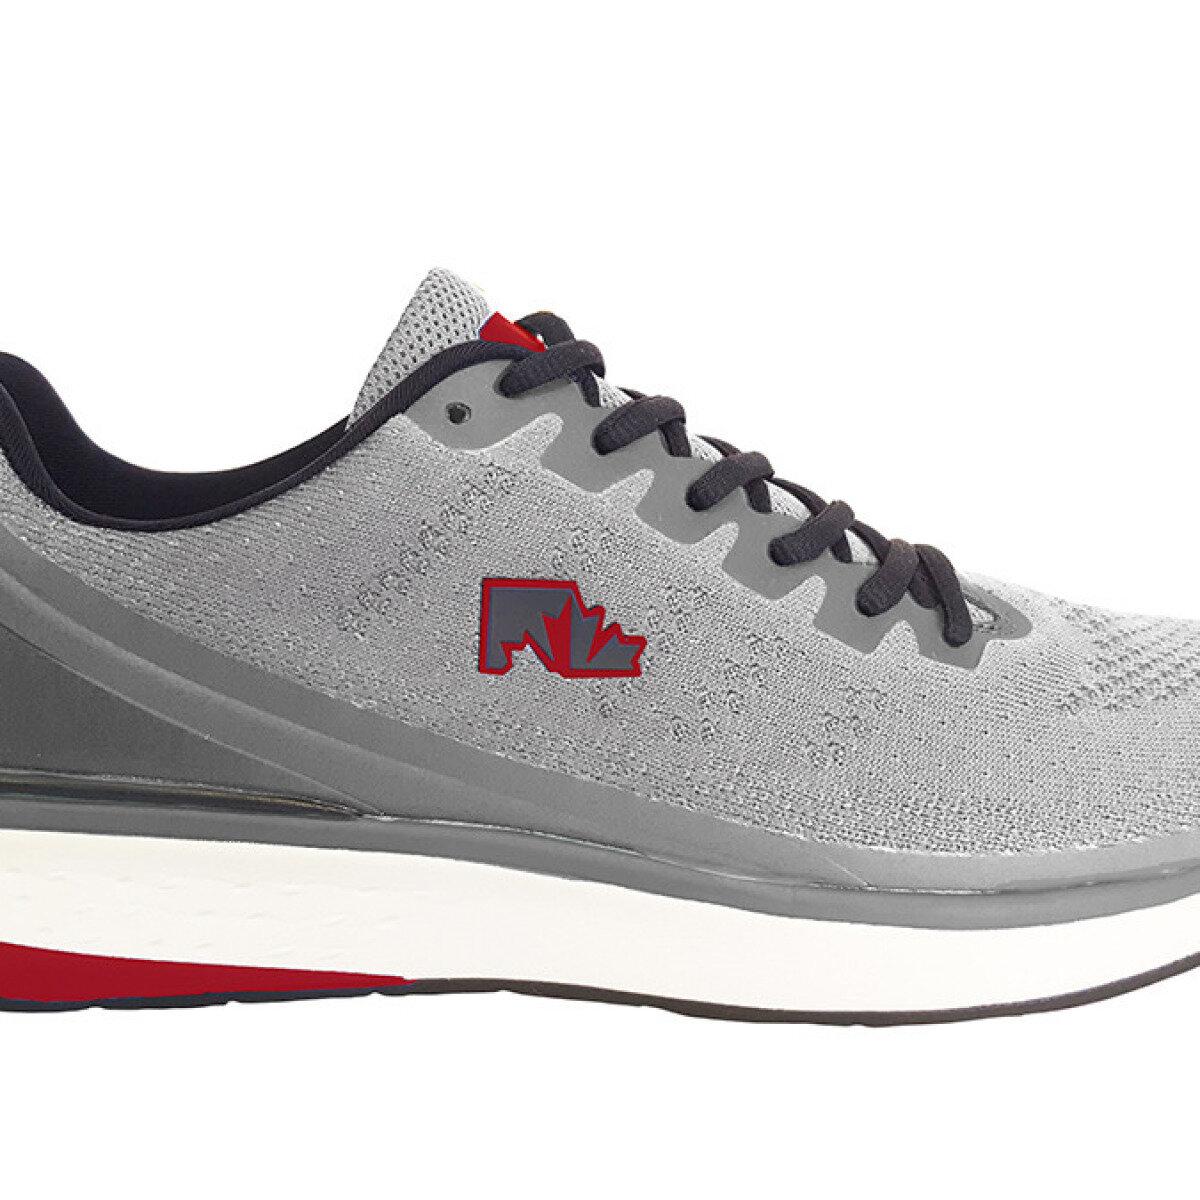 RONAN LT GREY Man Running shoes